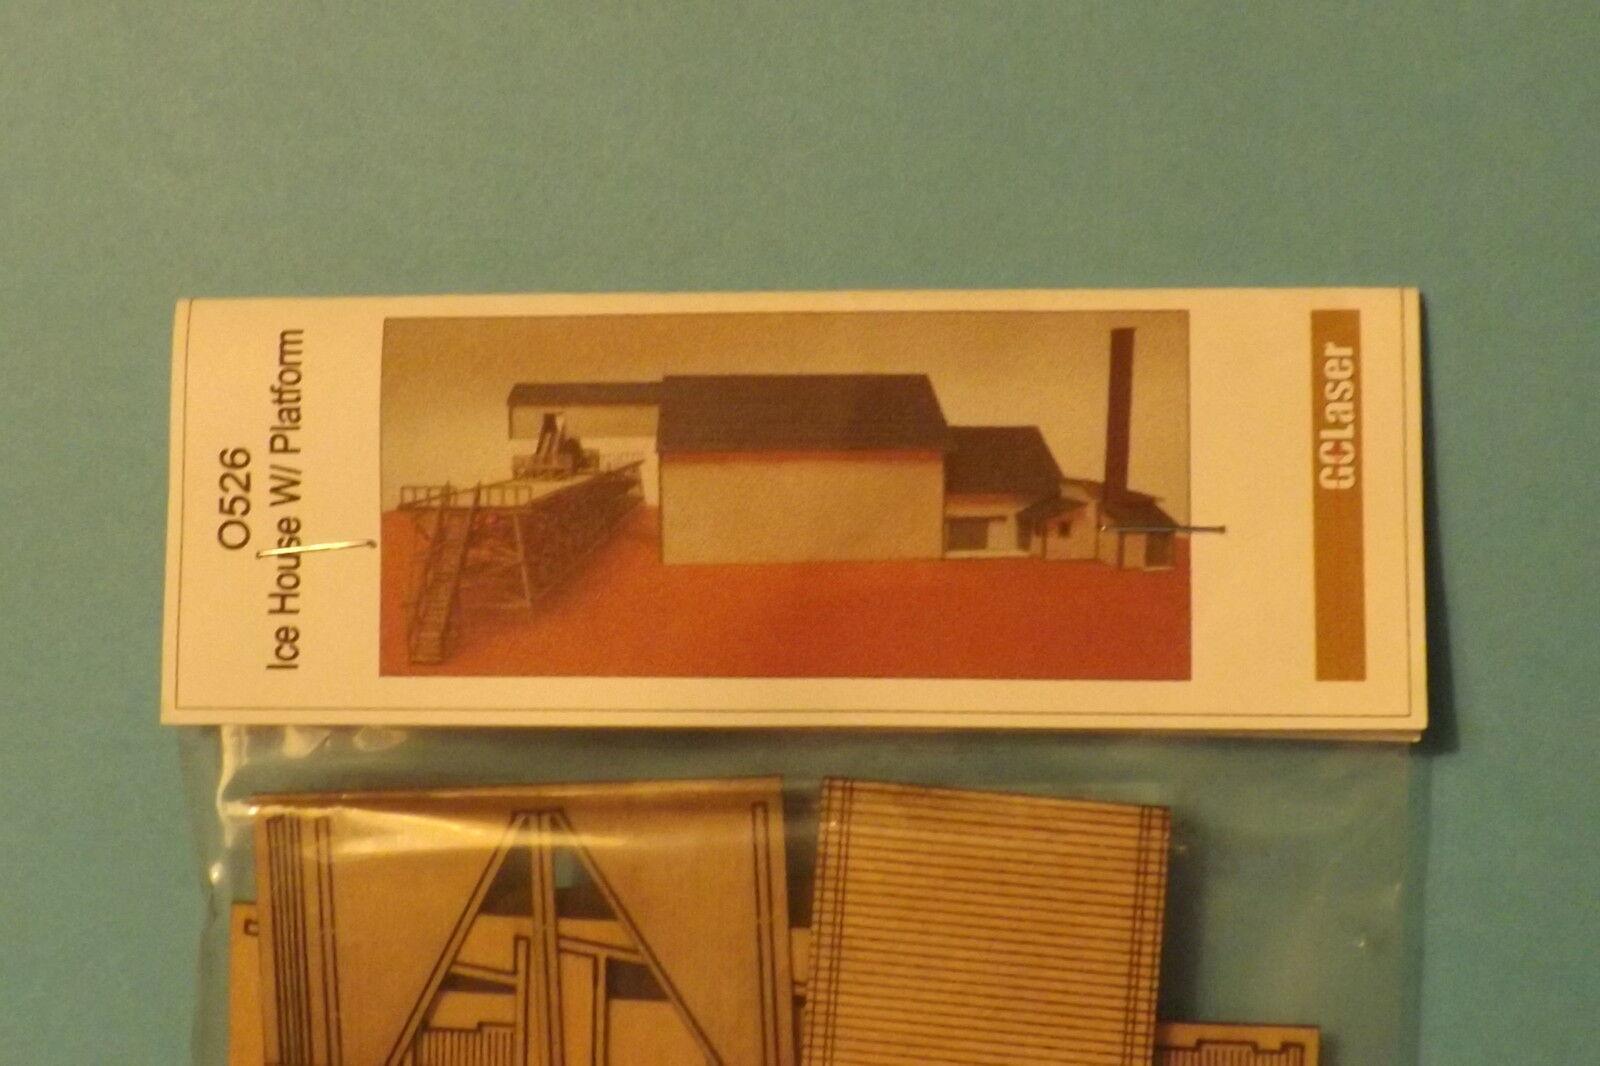 ICE HOUSE W PLATFORM KIT KIT KIT N SCALE by gc laser de913d